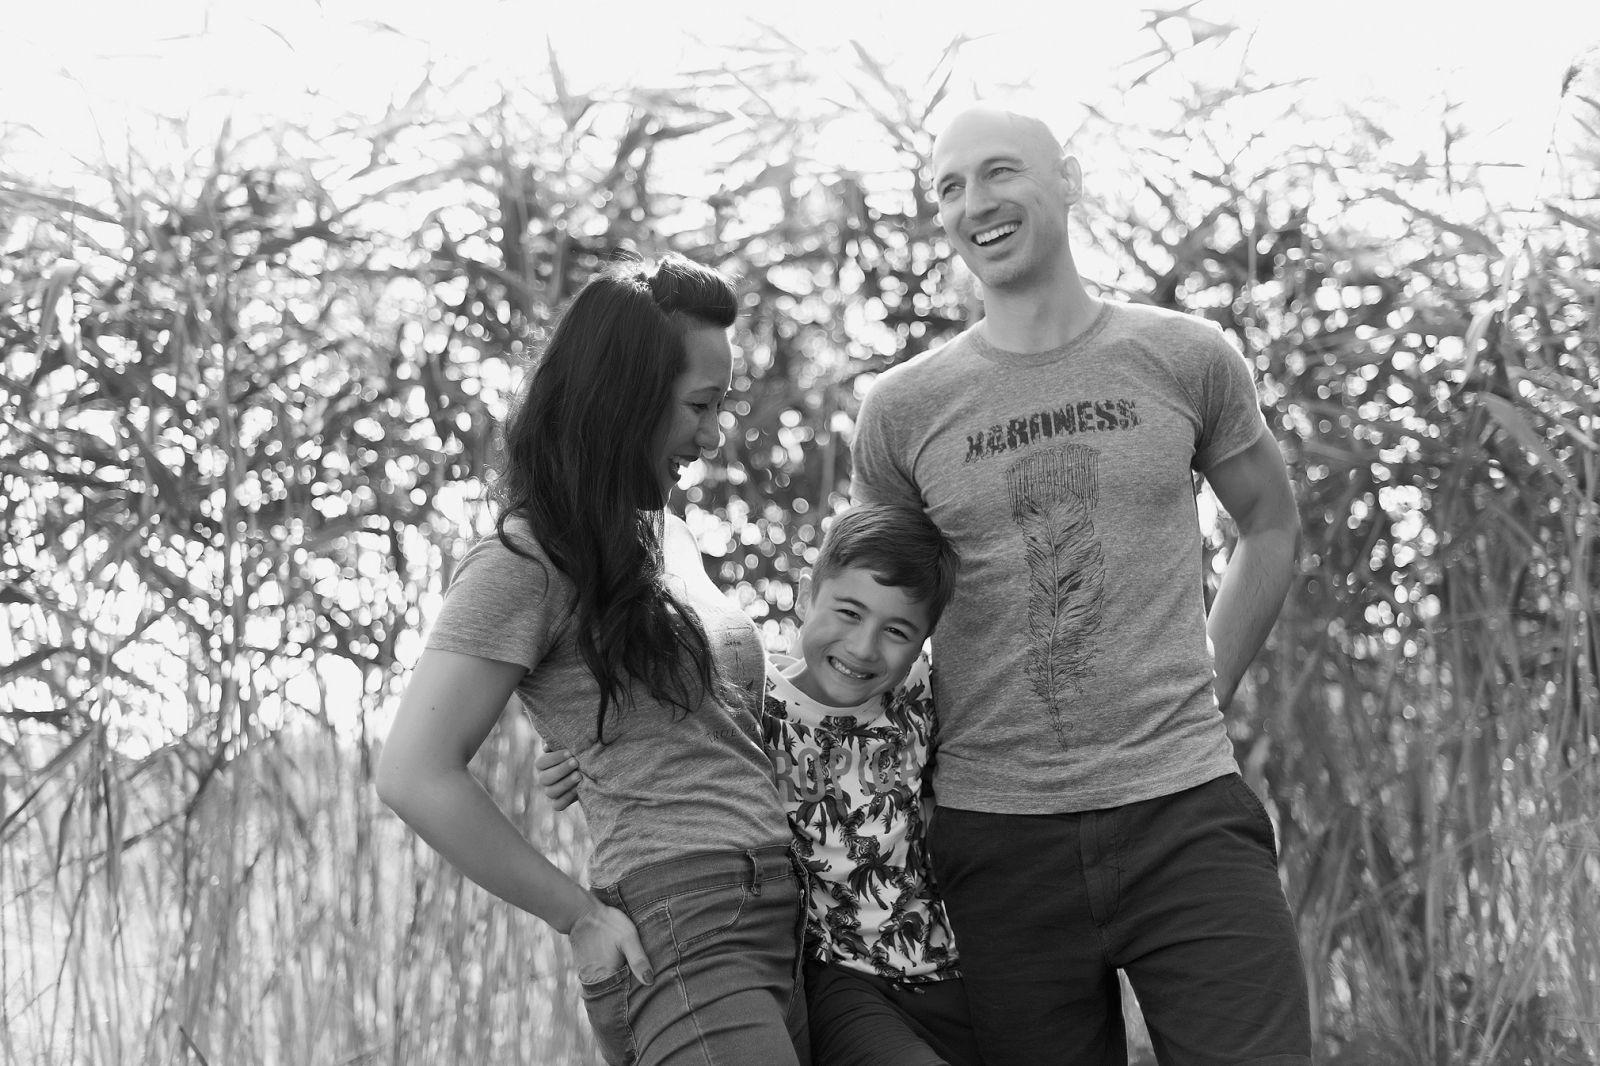 familienbilder familienfotografin frankfurt fotografin nidderau bruchköbel büdesheim kilianstädten kinderbilder familie fotografieren gelnhausen